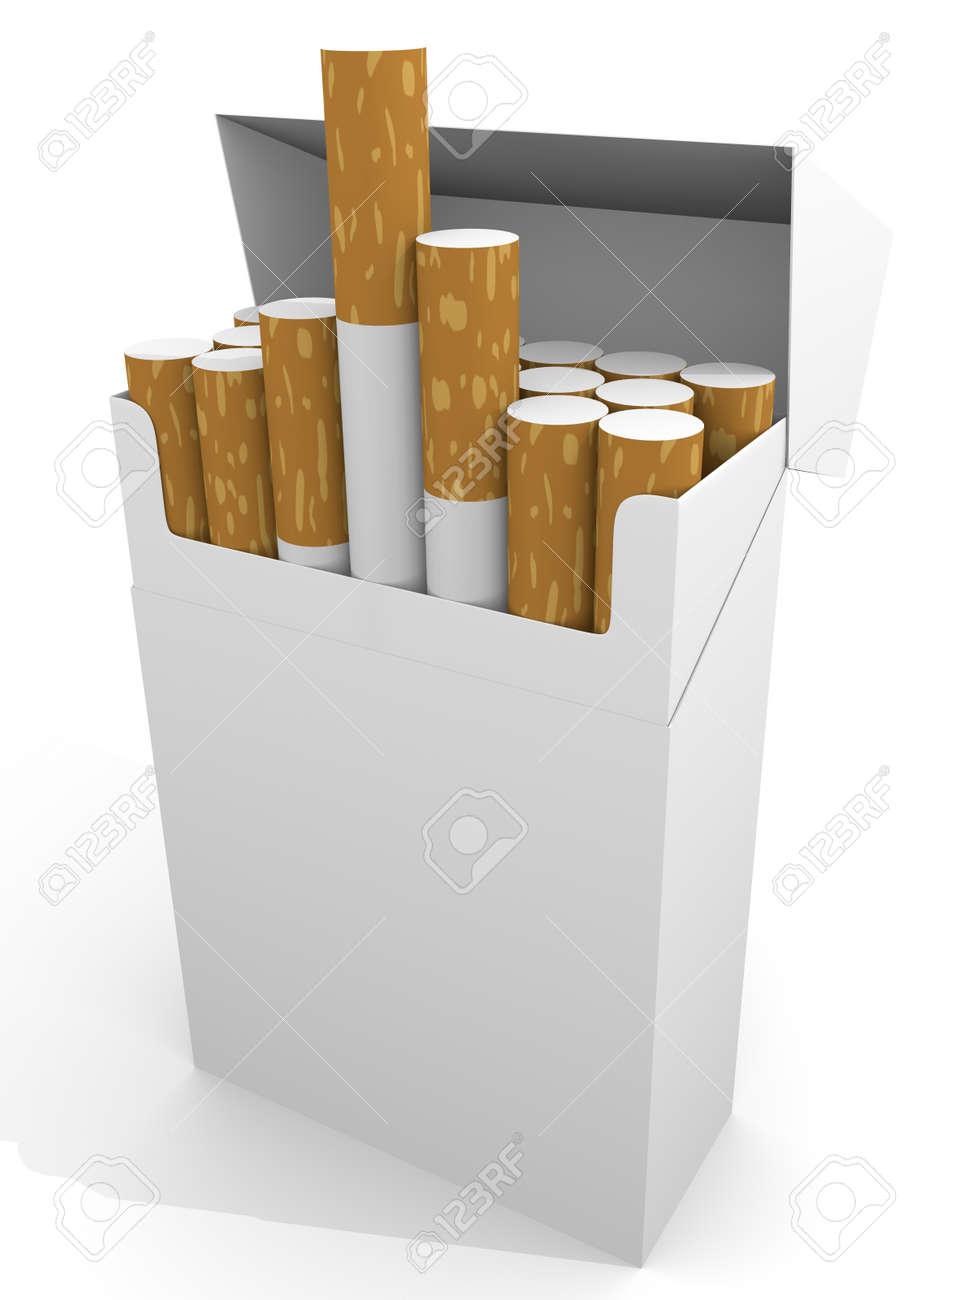 Open full pack of cigarettes in white. Stock Photo - 11850067